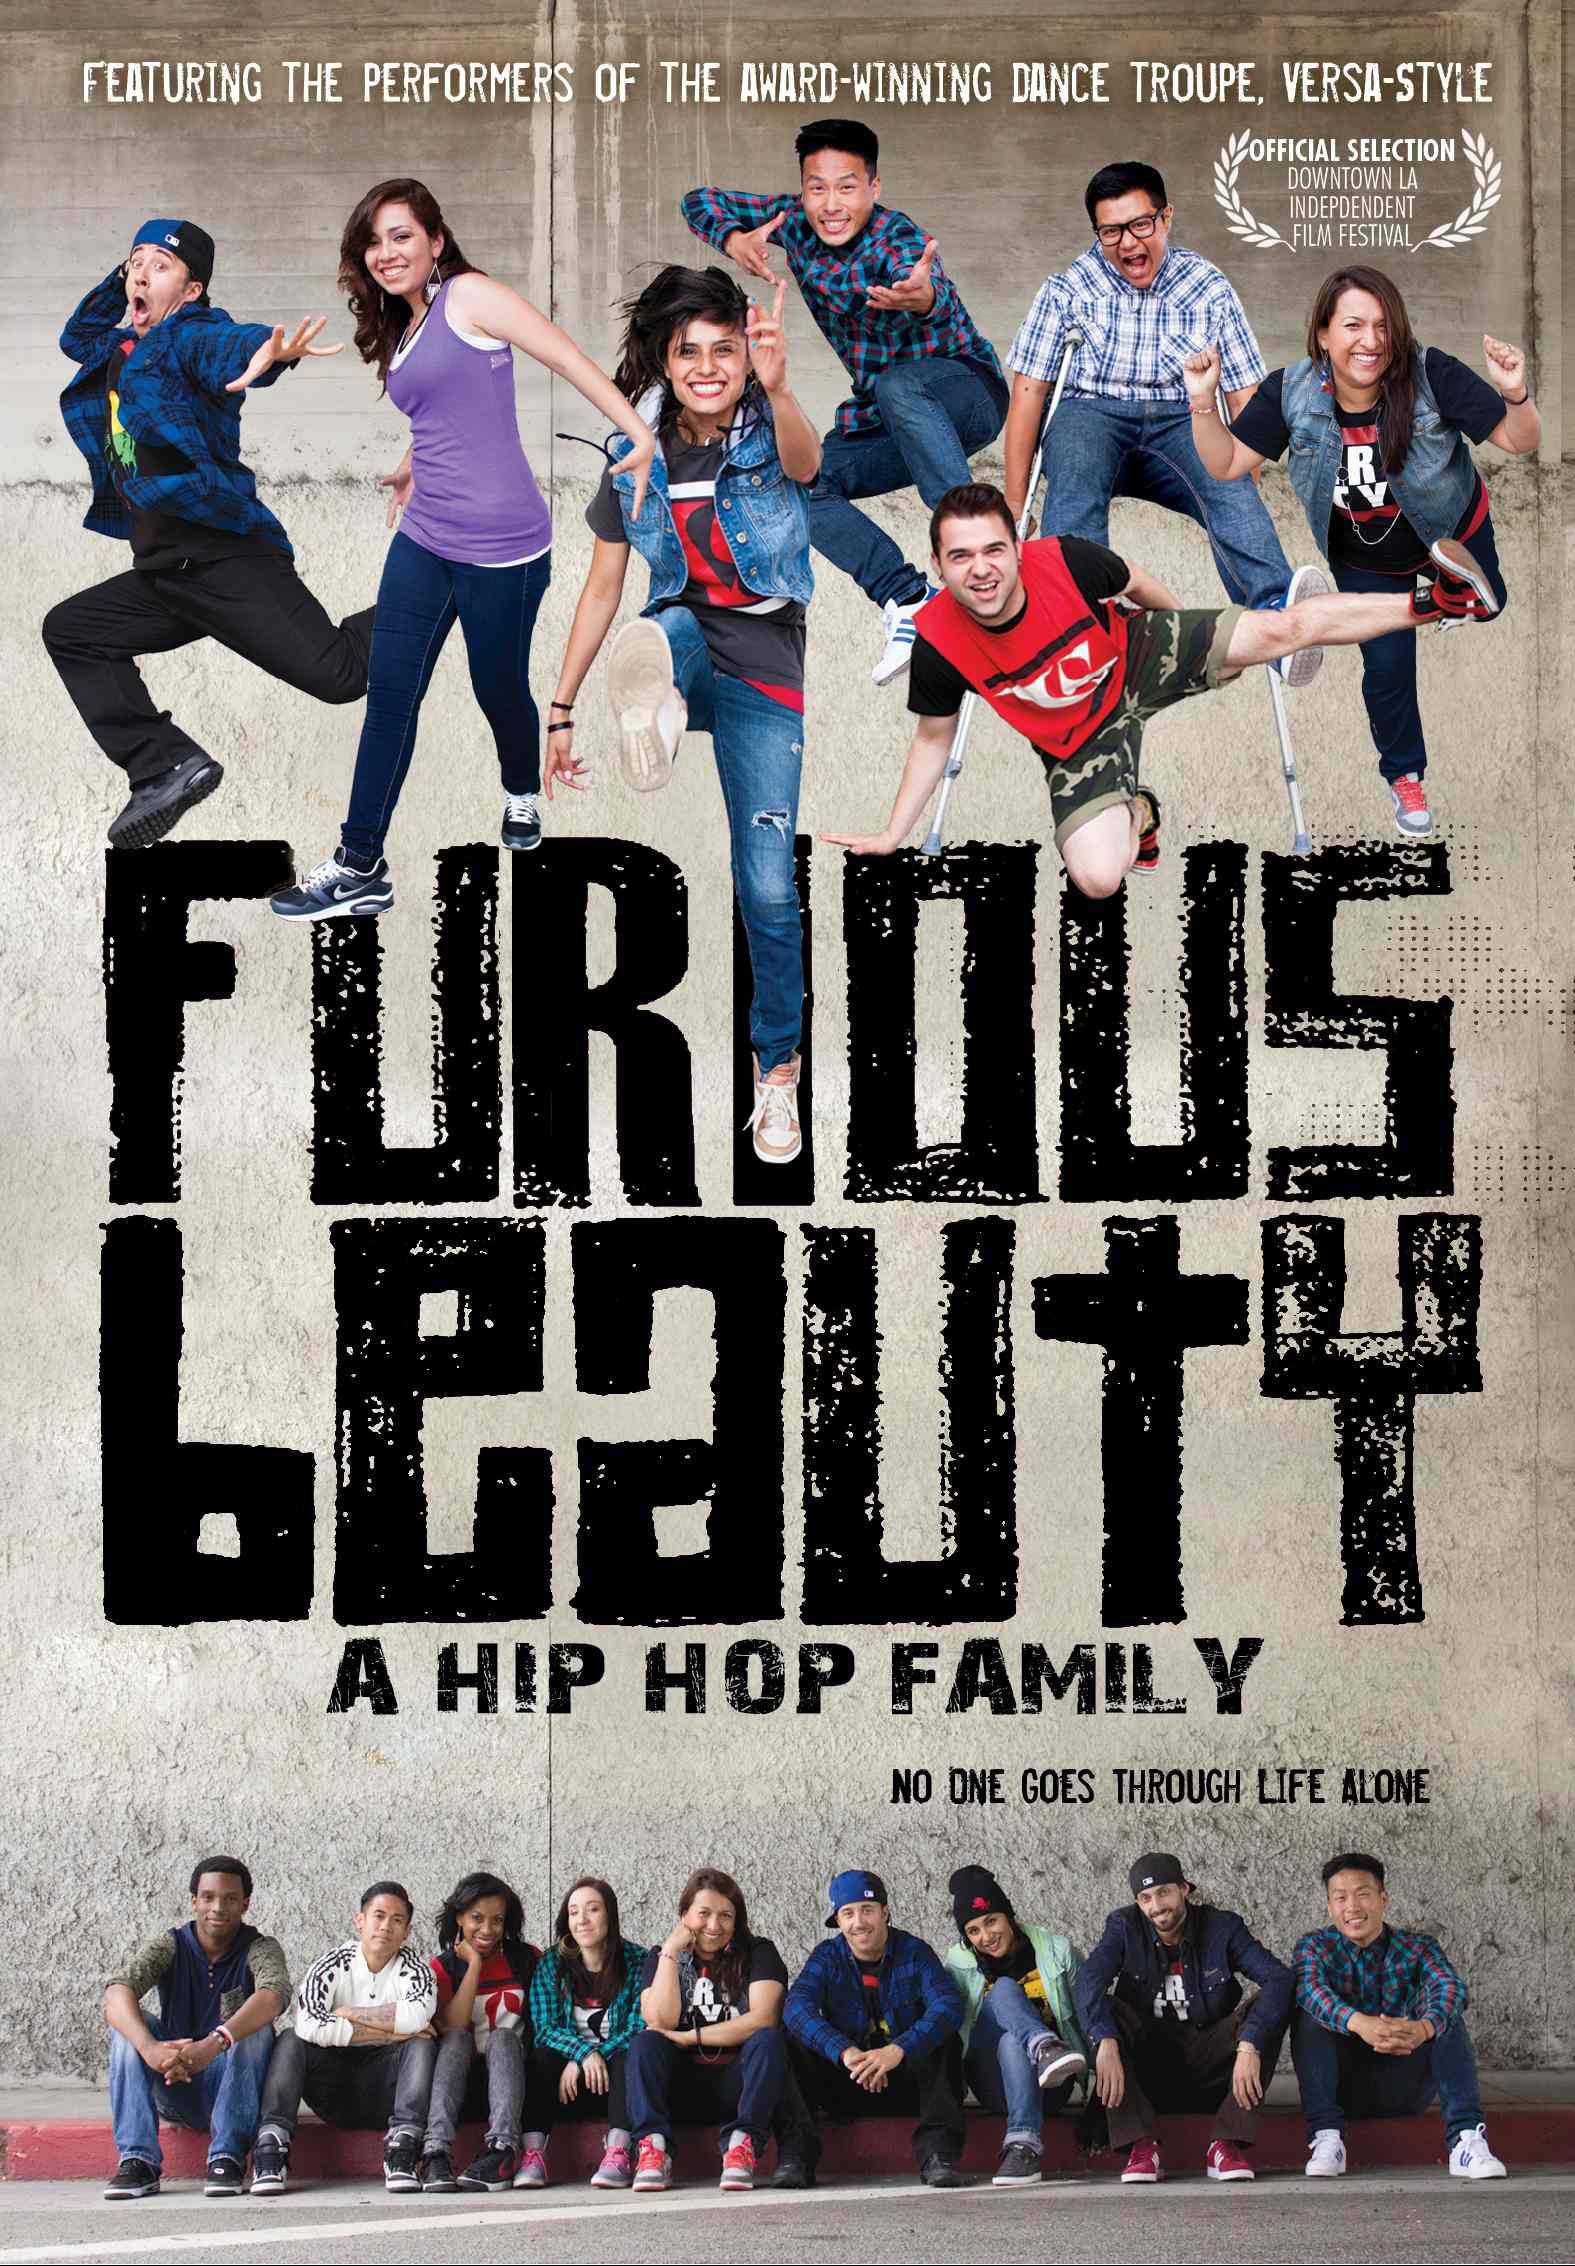 Furious Beauty: A Hip Hop Family